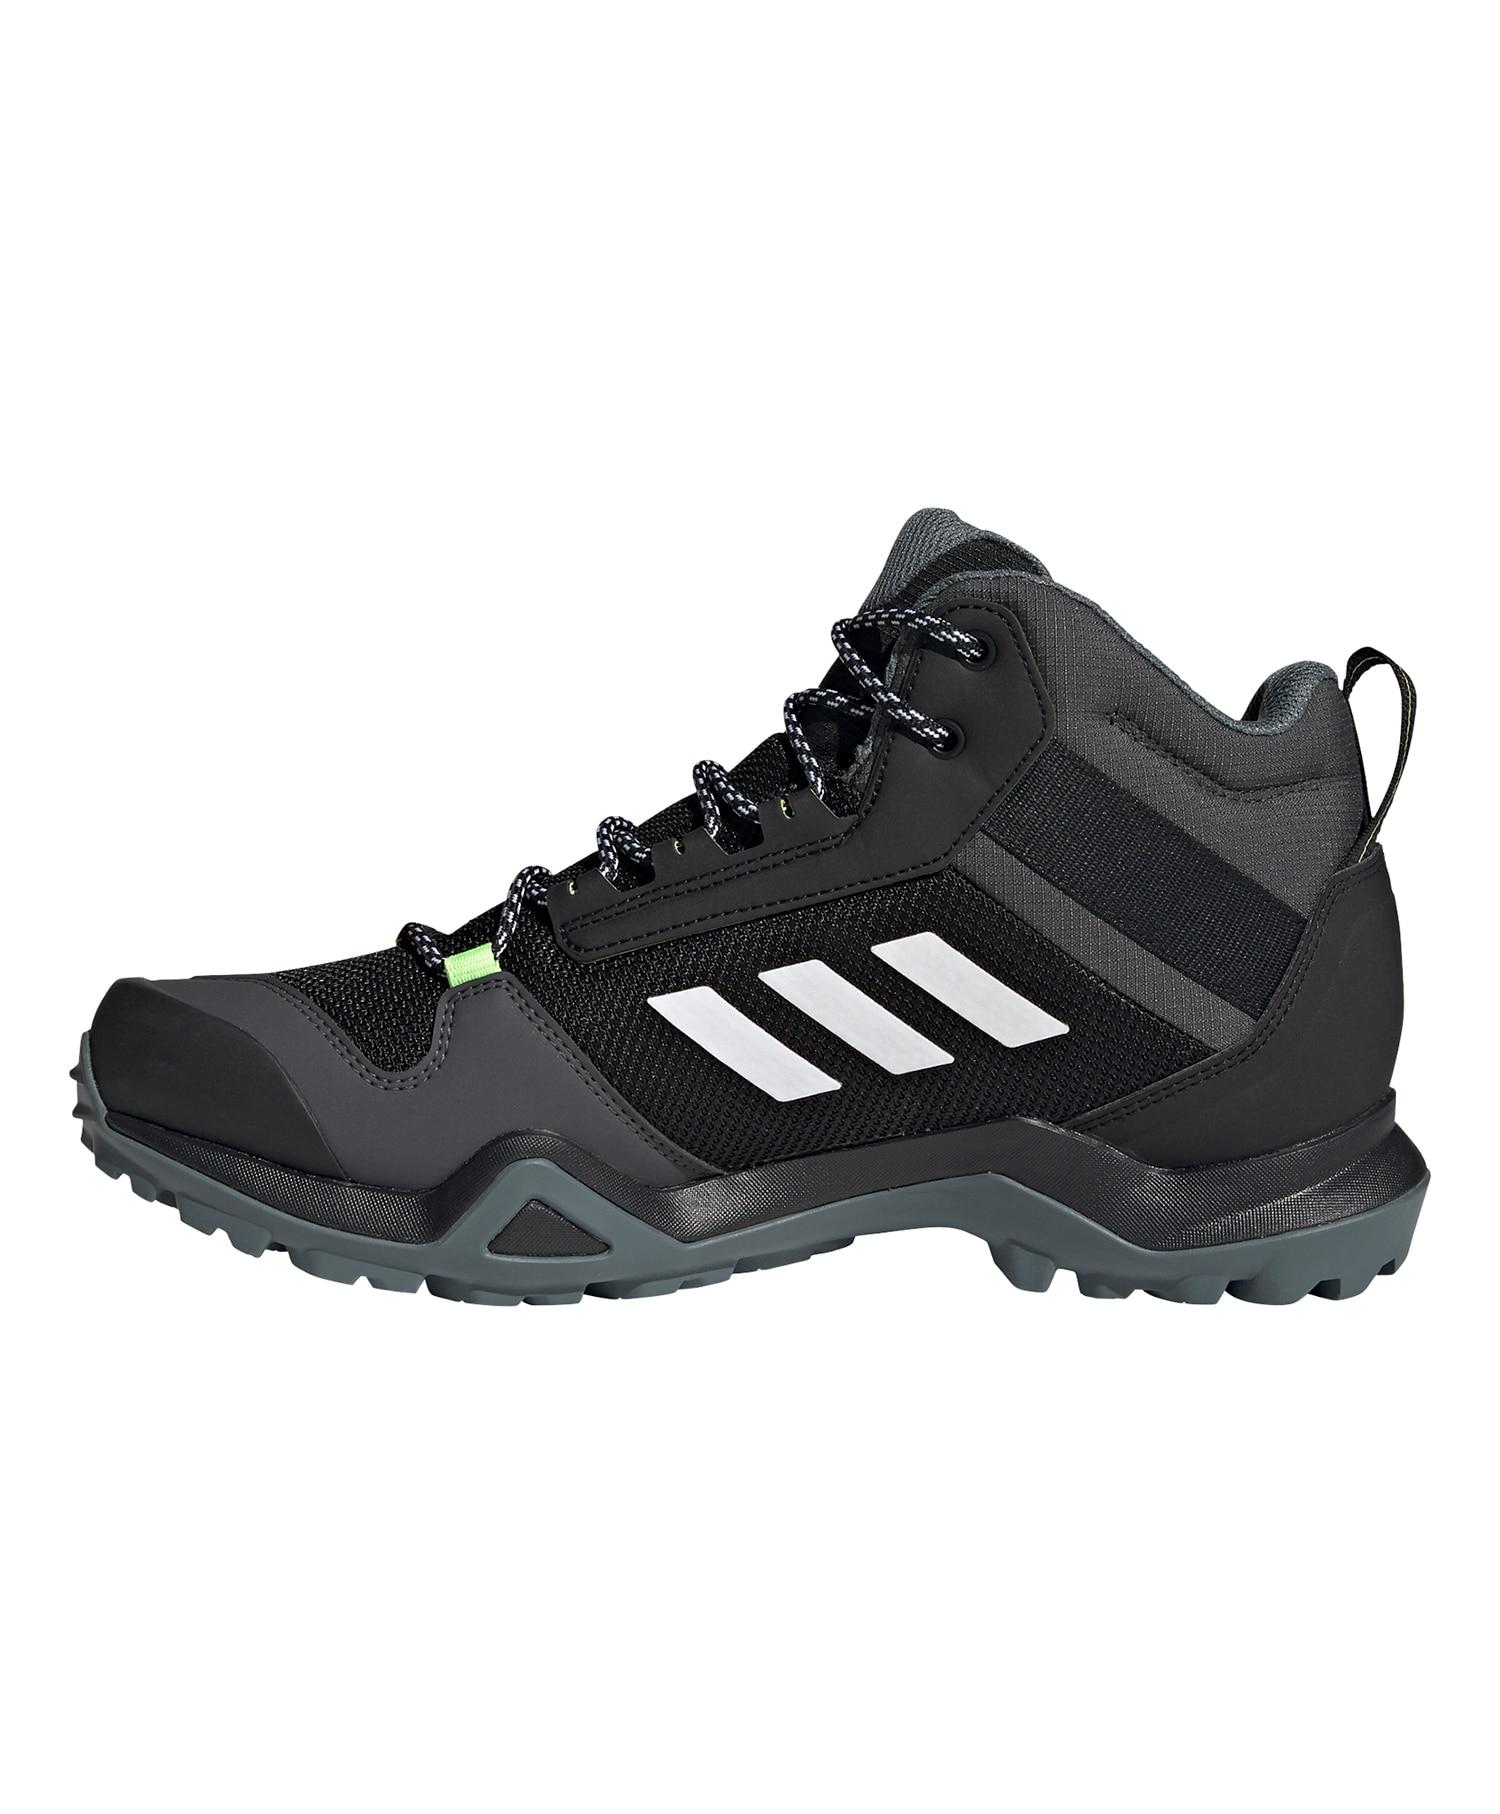 Adidas Terrex mid AX3 GTX